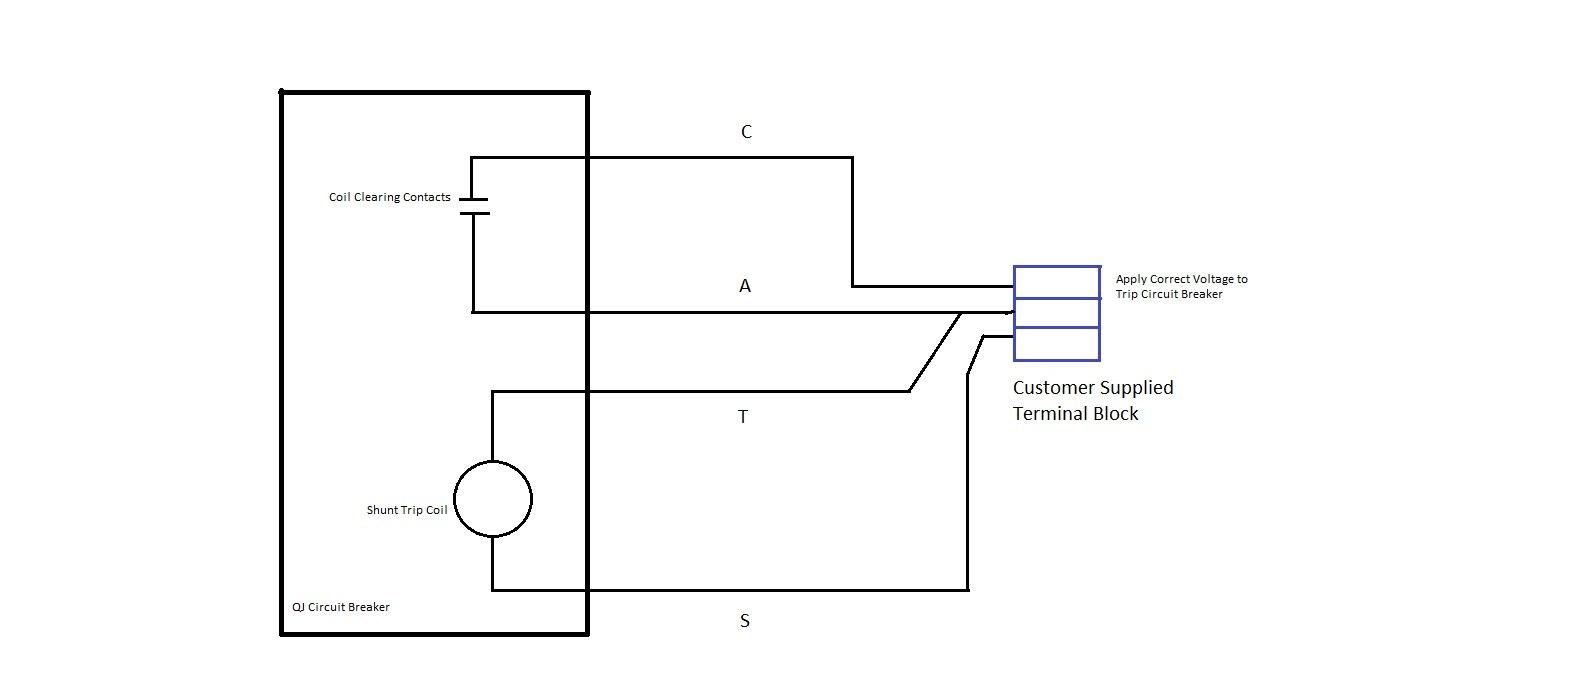 shunt breaker wiring diagram Collection-Circuit Breaker Schematic Diagram Nice Siemens Shunt Trip Breaker Wiring Diagram Elvenlabs 34 Stunning Circuit 1-b